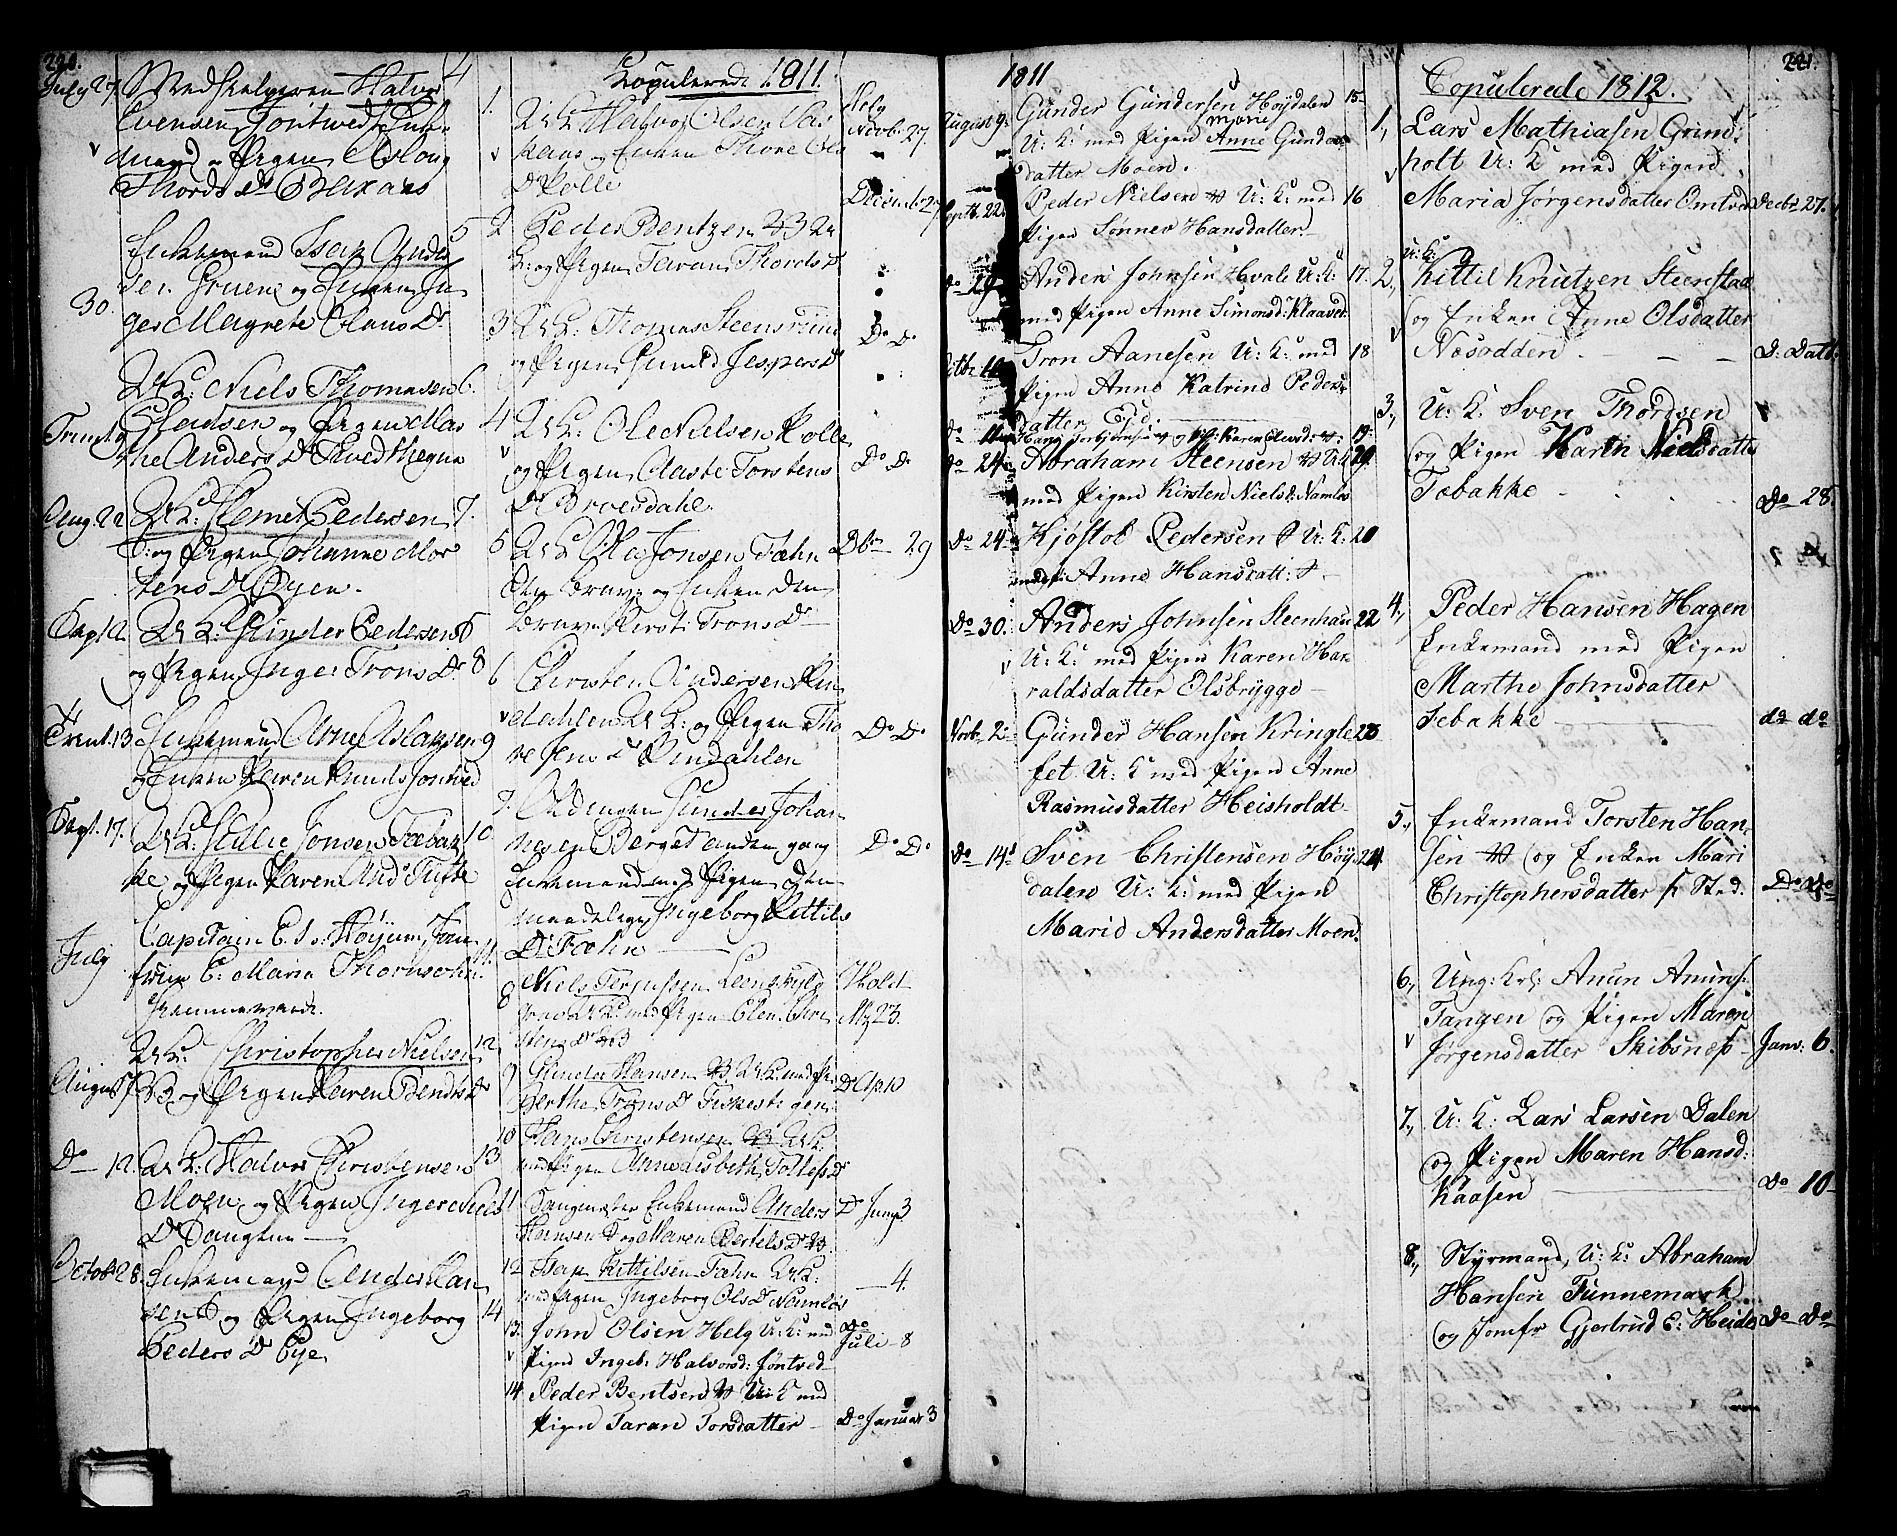 SAKO, Holla kirkebøker, F/Fa/L0002: Ministerialbok nr. 2, 1779-1814, s. 220-221